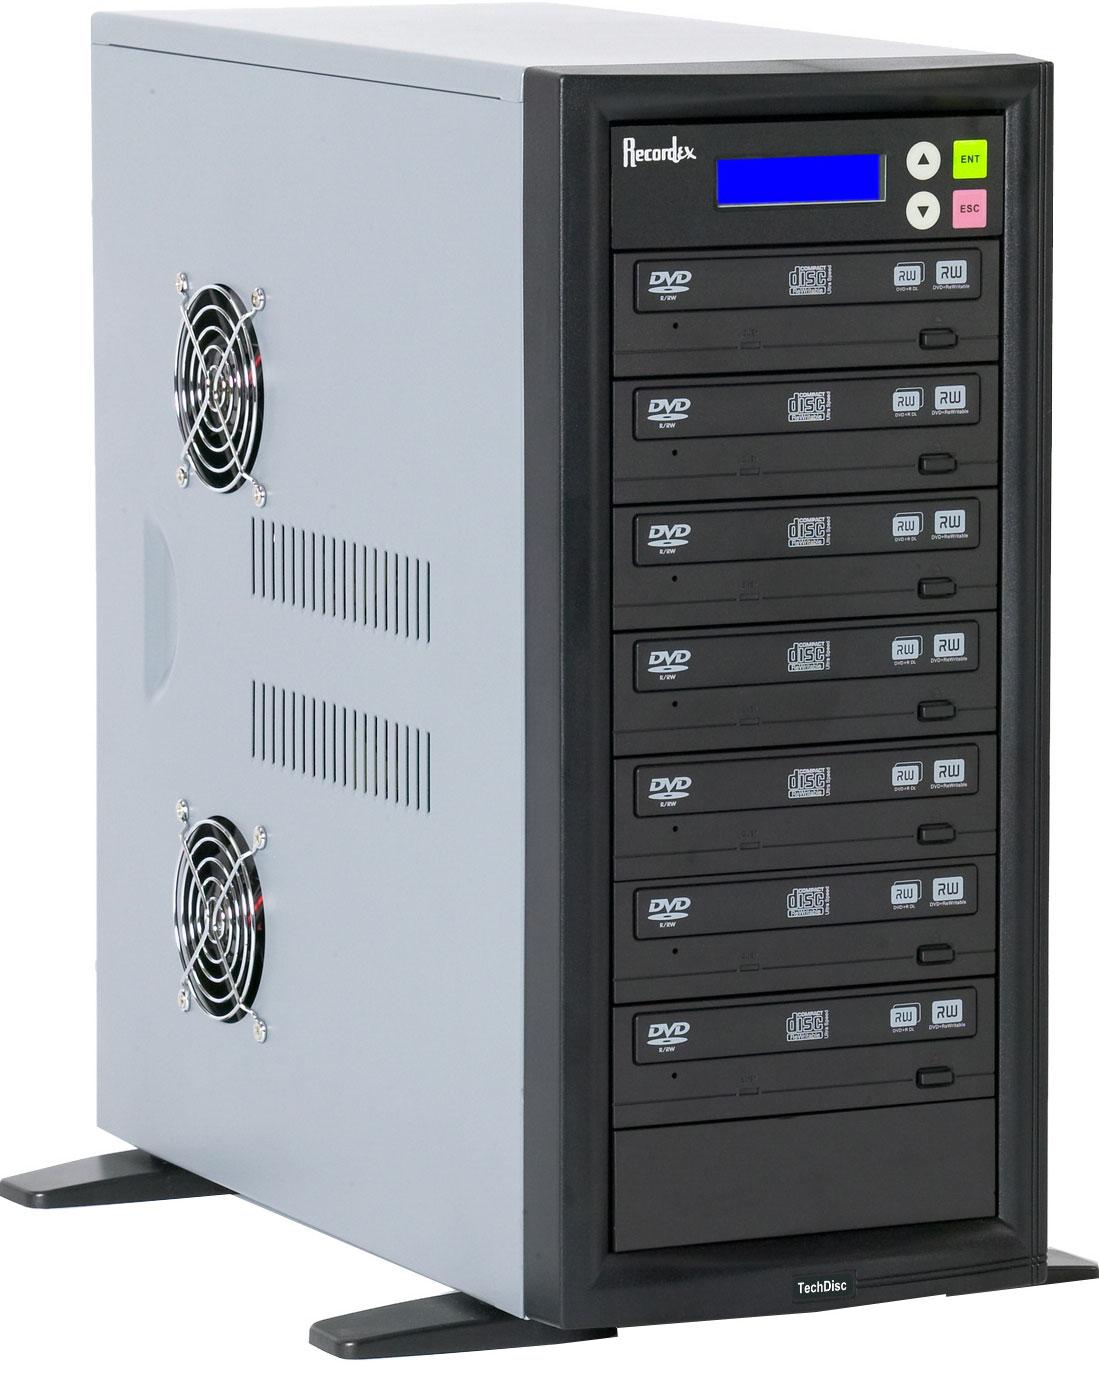 CD/DVD Duplicator with 7 Target Drives, 250 GB Hard Drive